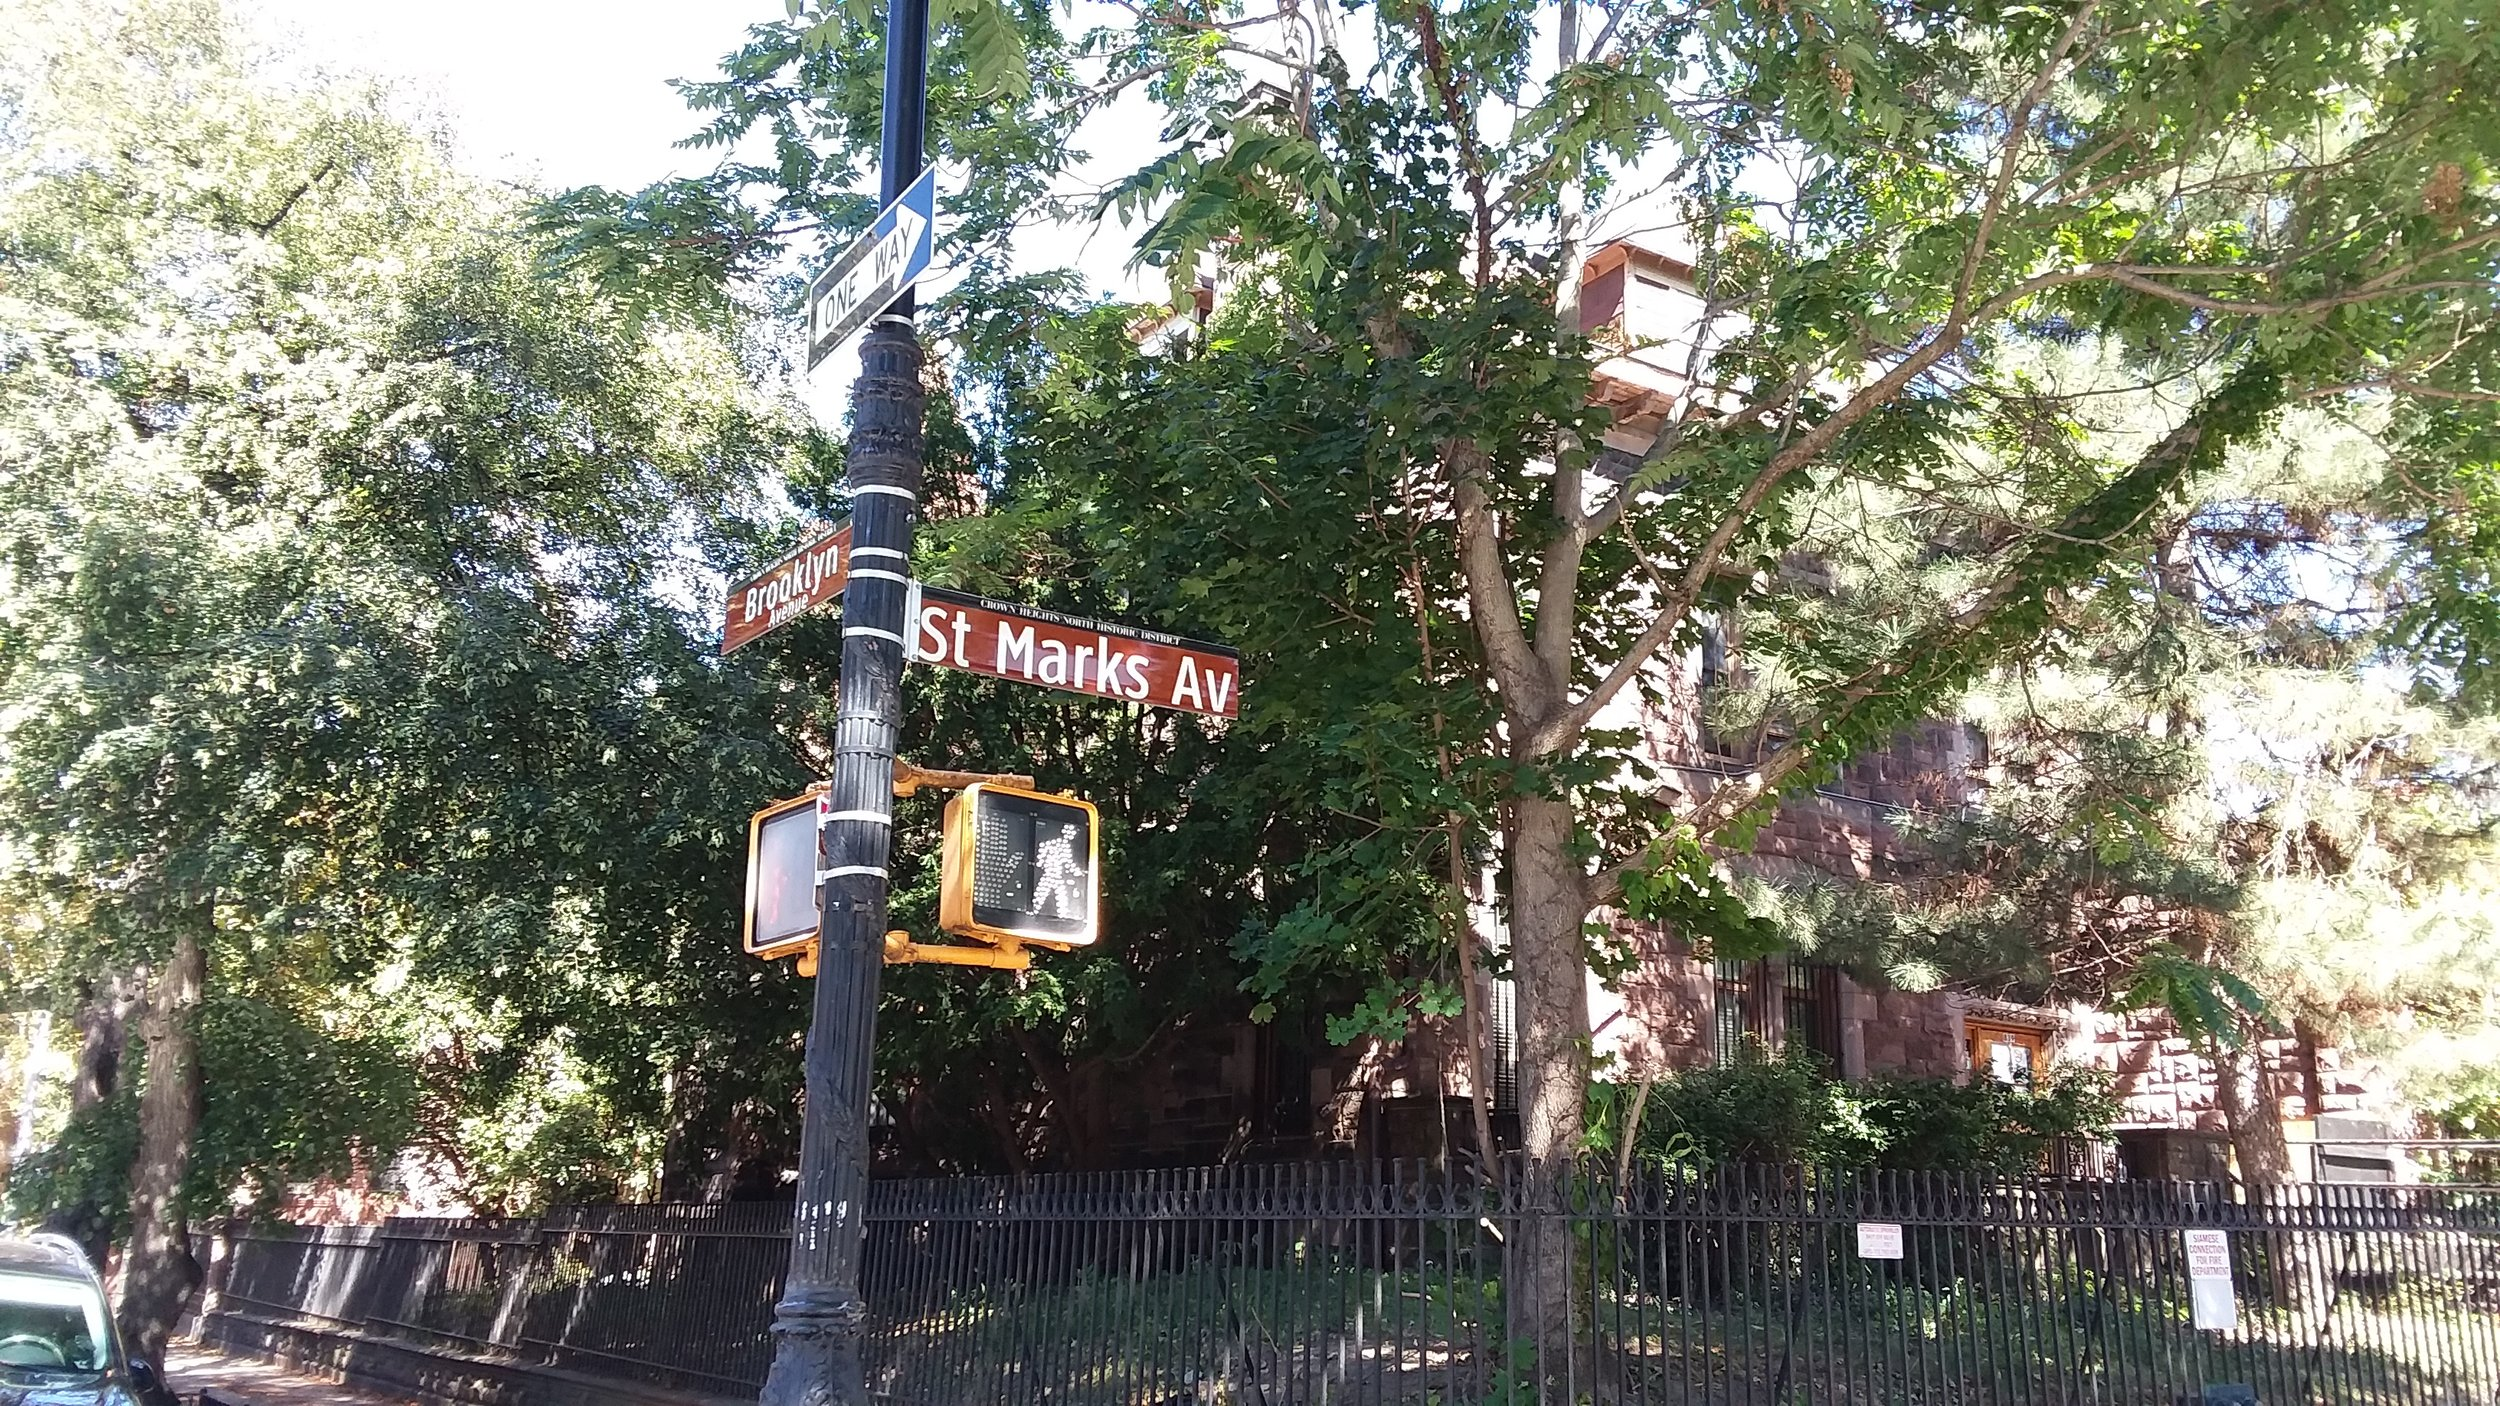 839 St. Marks Ave., Brooklyn. Photo: Darryl Montgomery.